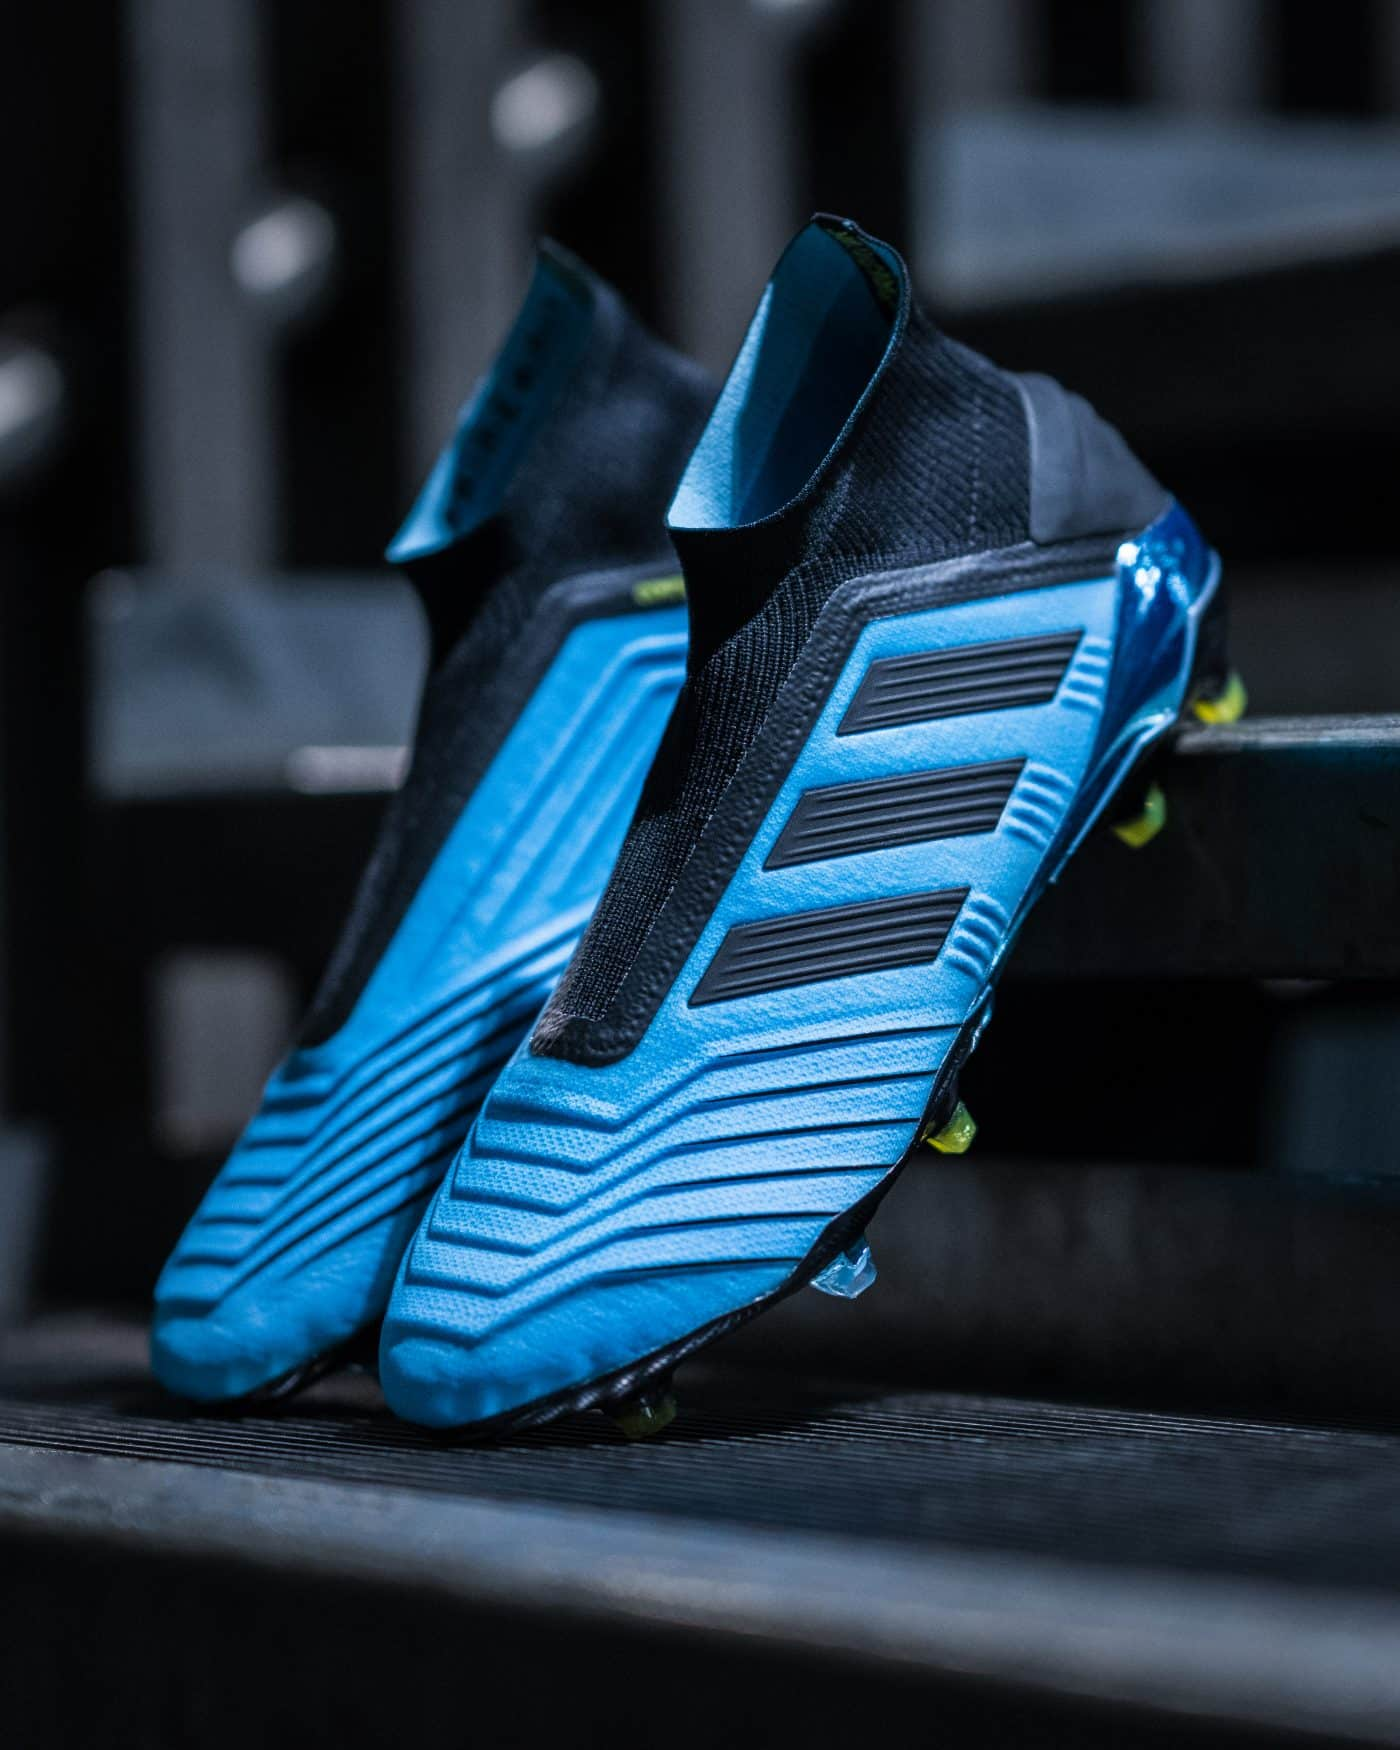 adidas-predator-19-pack-hard-wired-juillet-2019-4